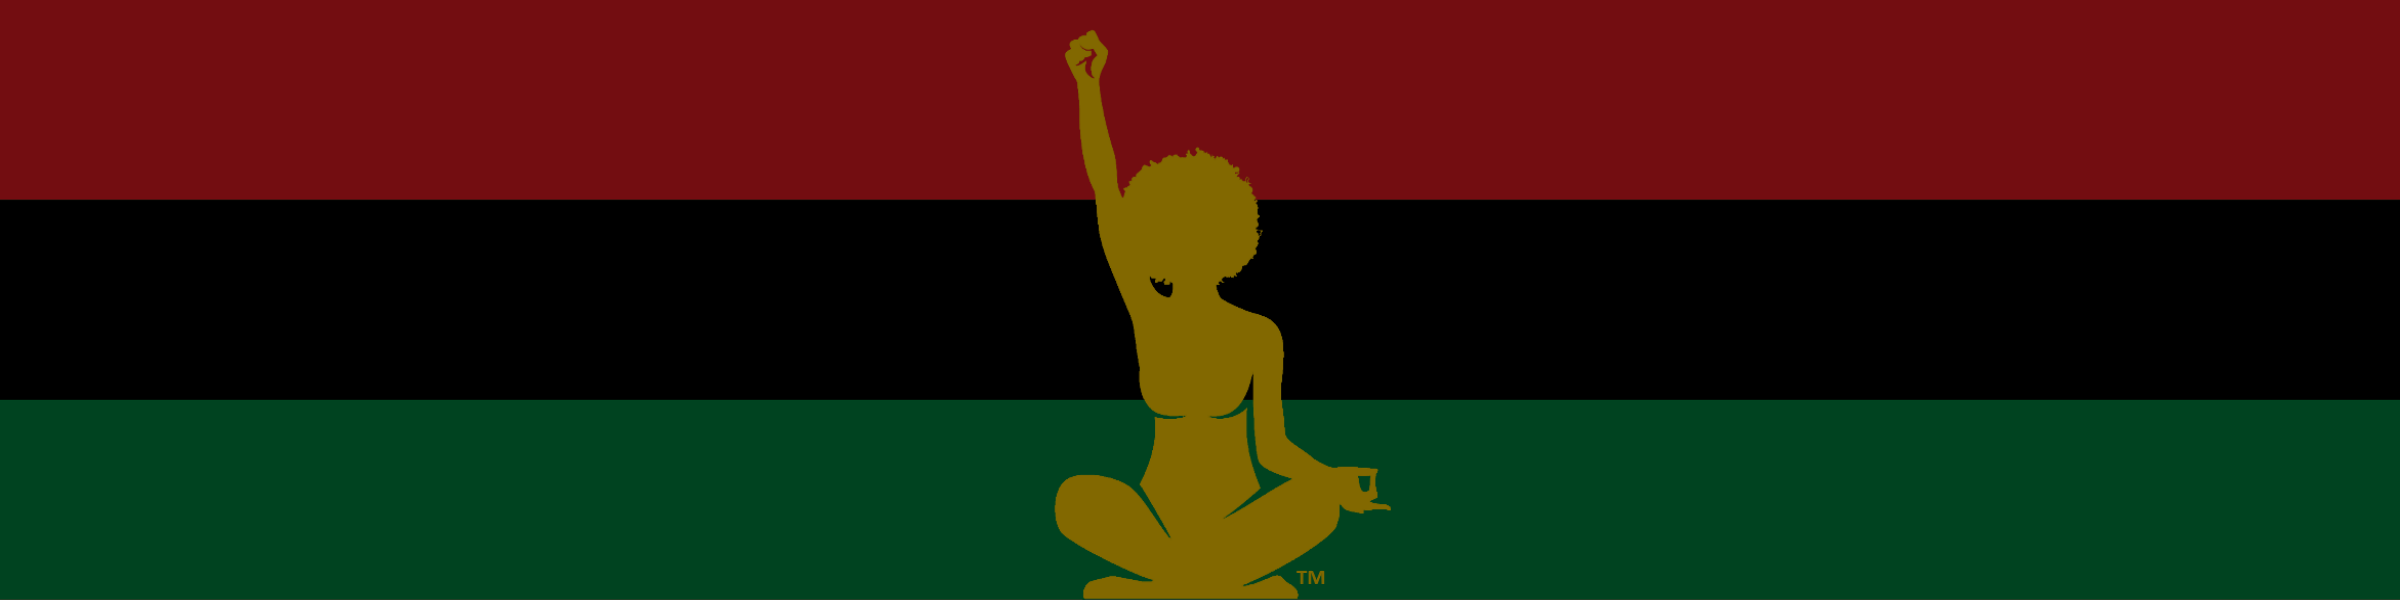 Soul Liberation trademarked logo